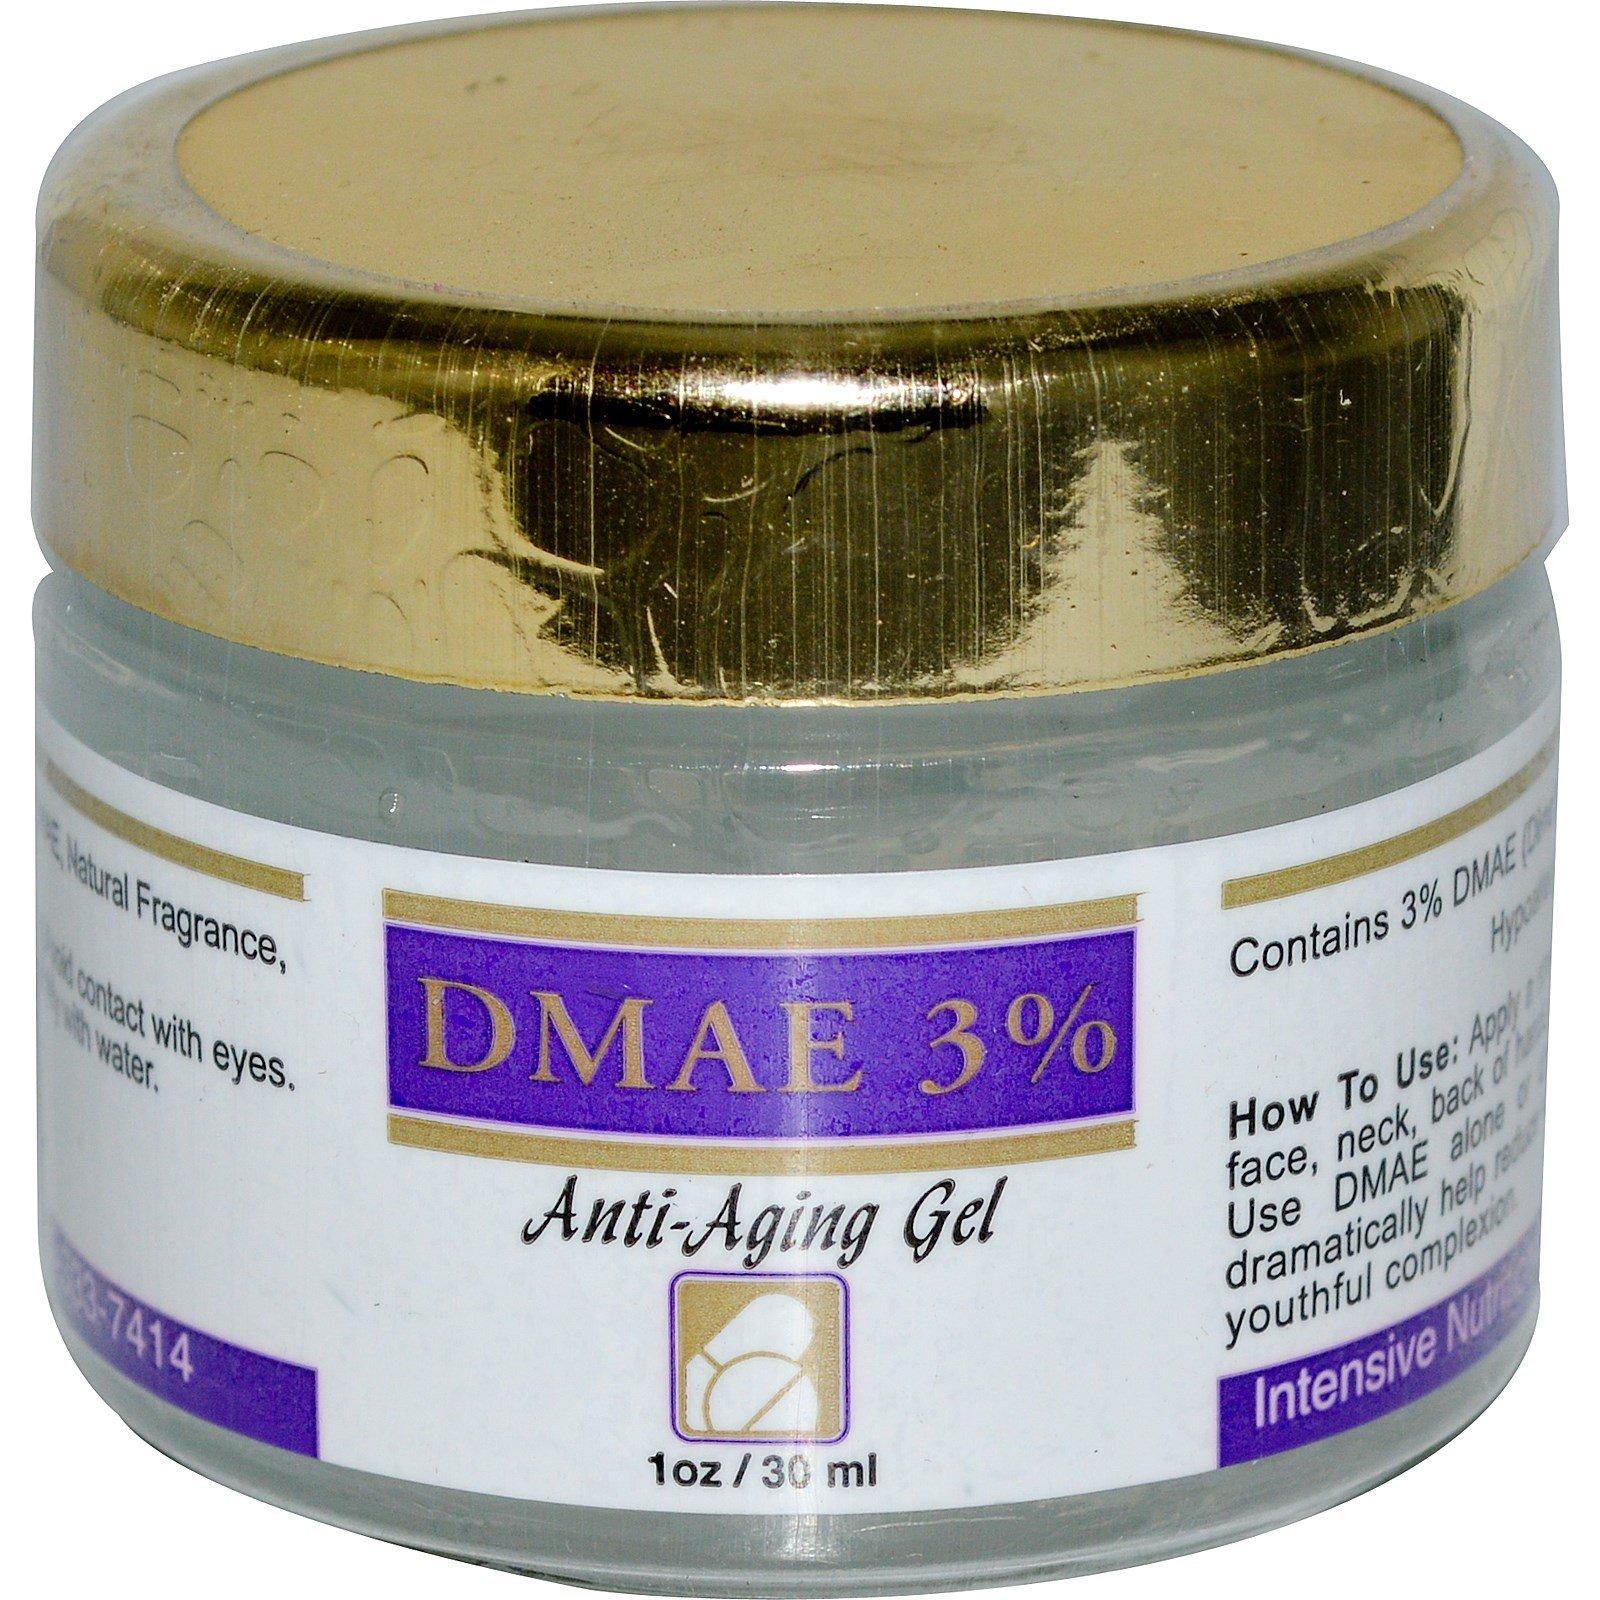 Intensive Nutrition, DMAE 3%, Anti-Aging Gel, 1 oz (30 ml) - 3PC